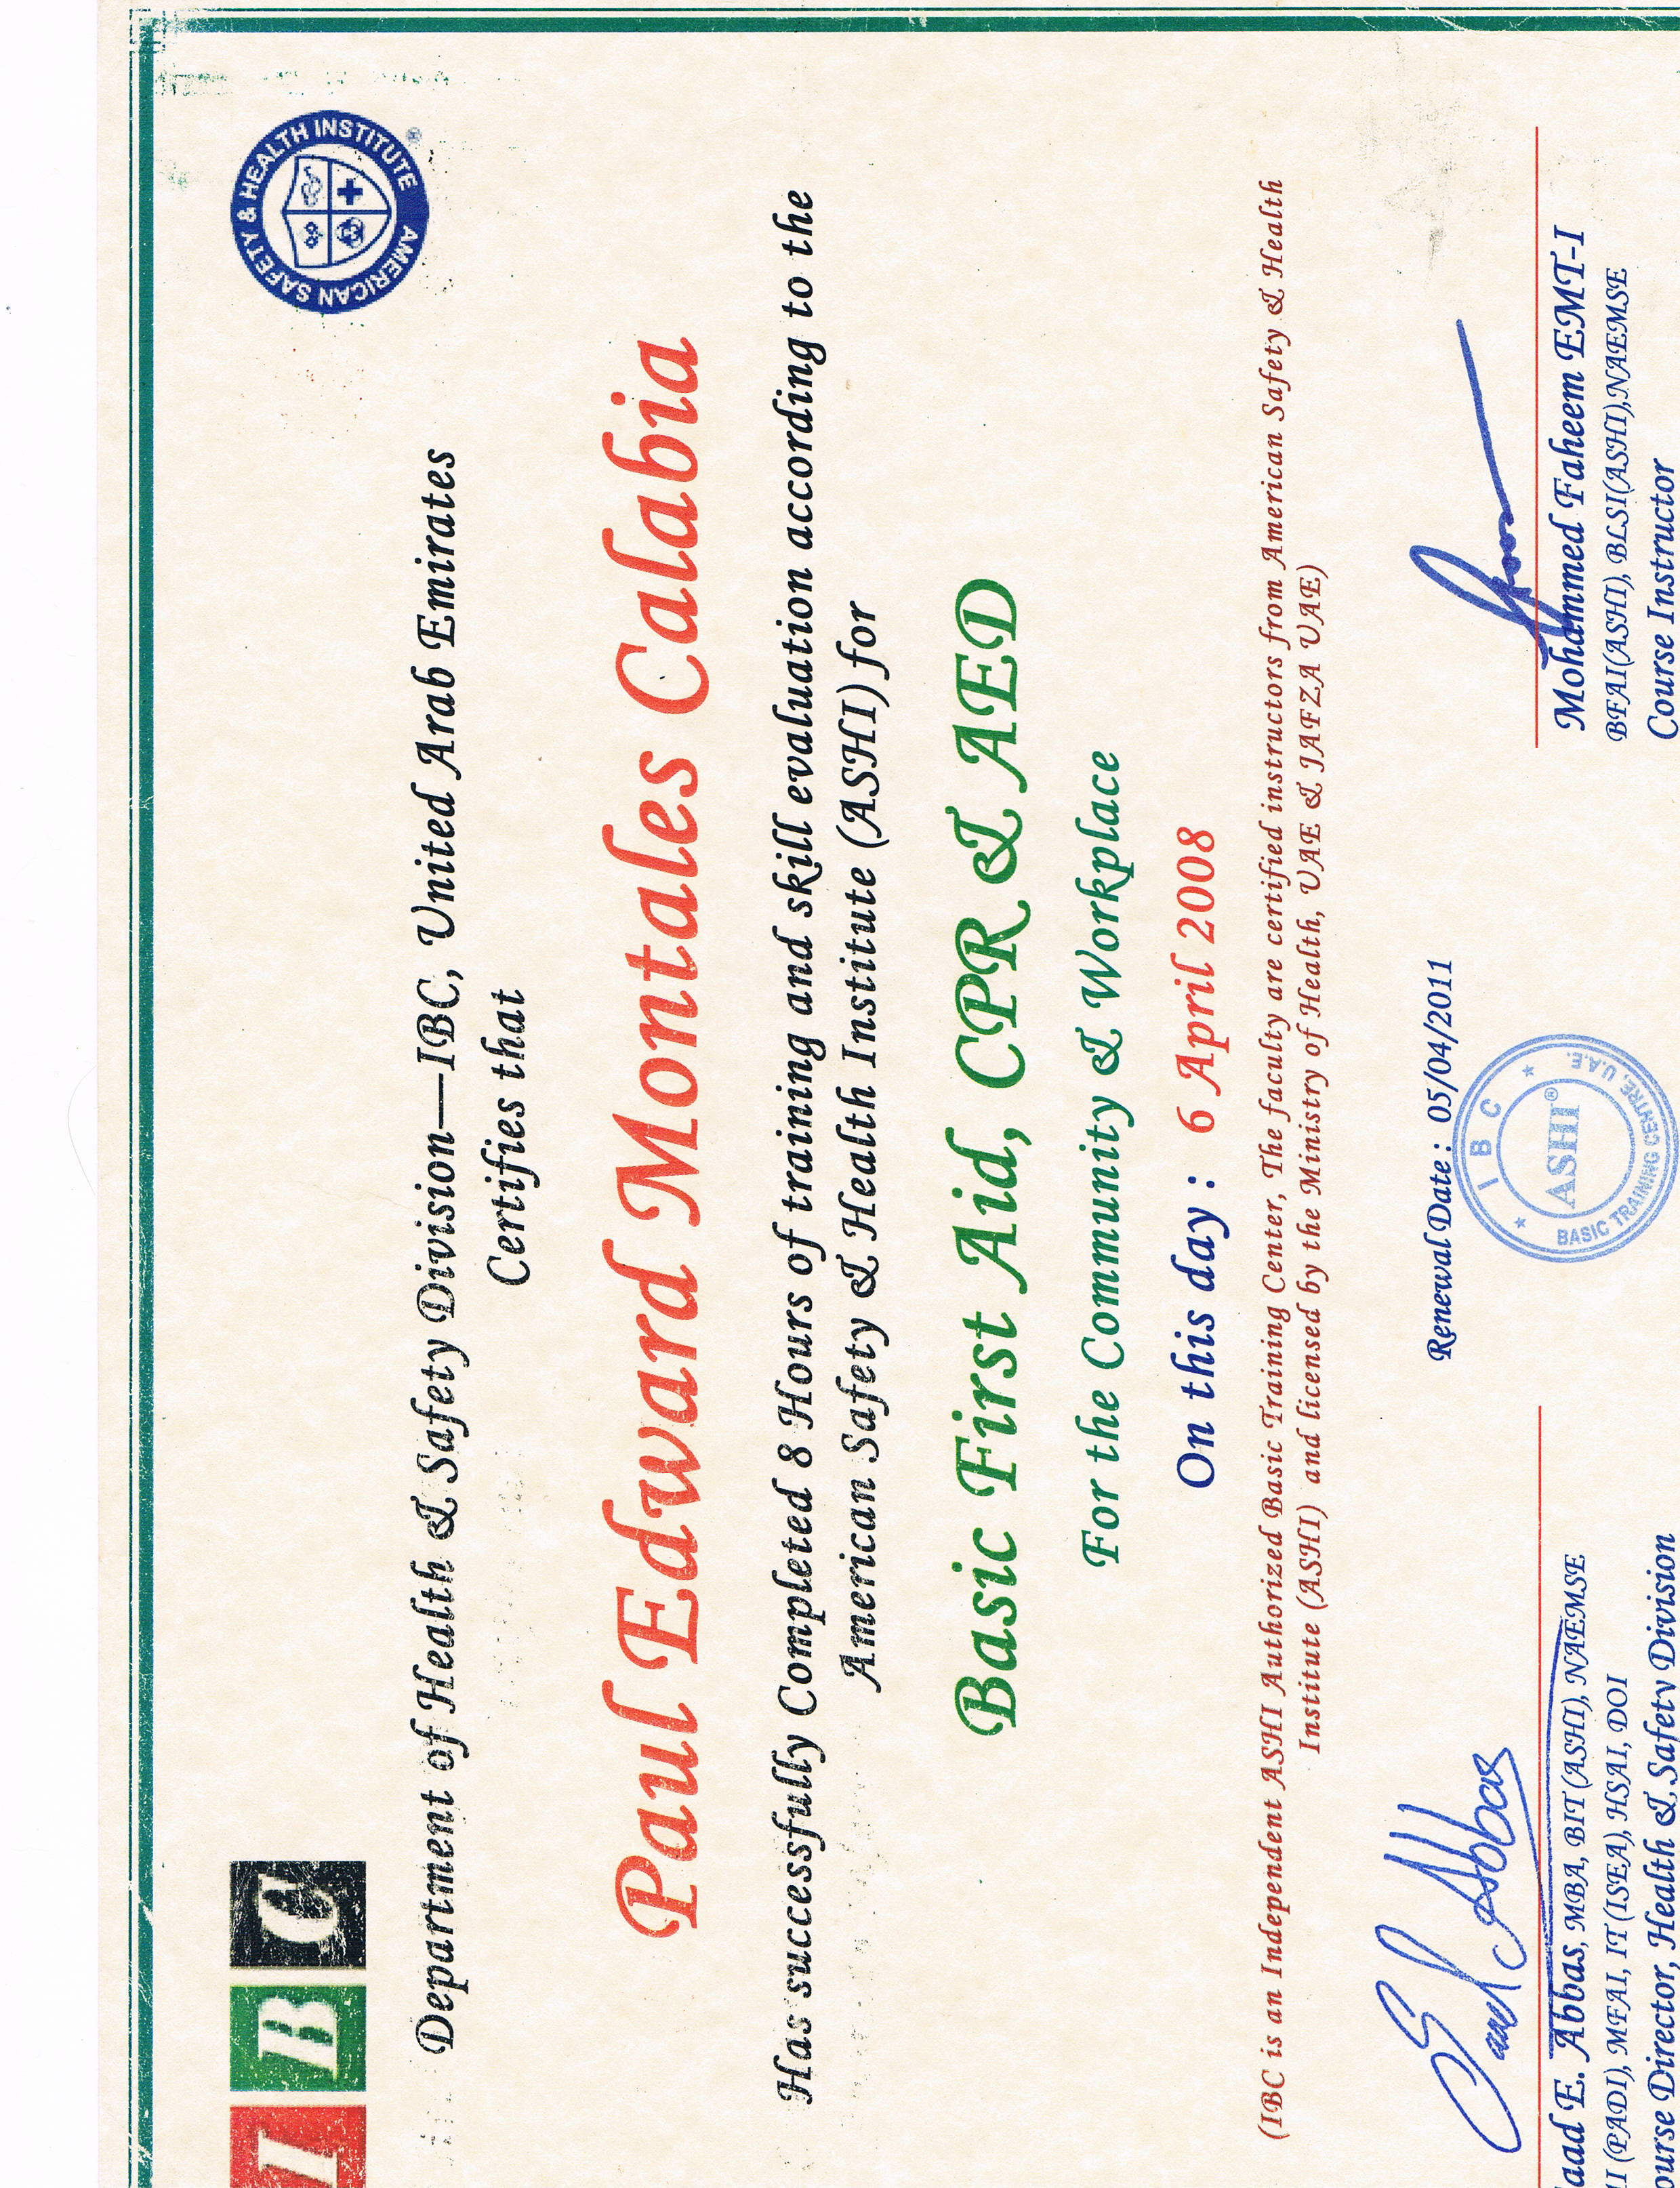 Paul edward calabia bayt training institute dubai institute of business management xflitez Image collections